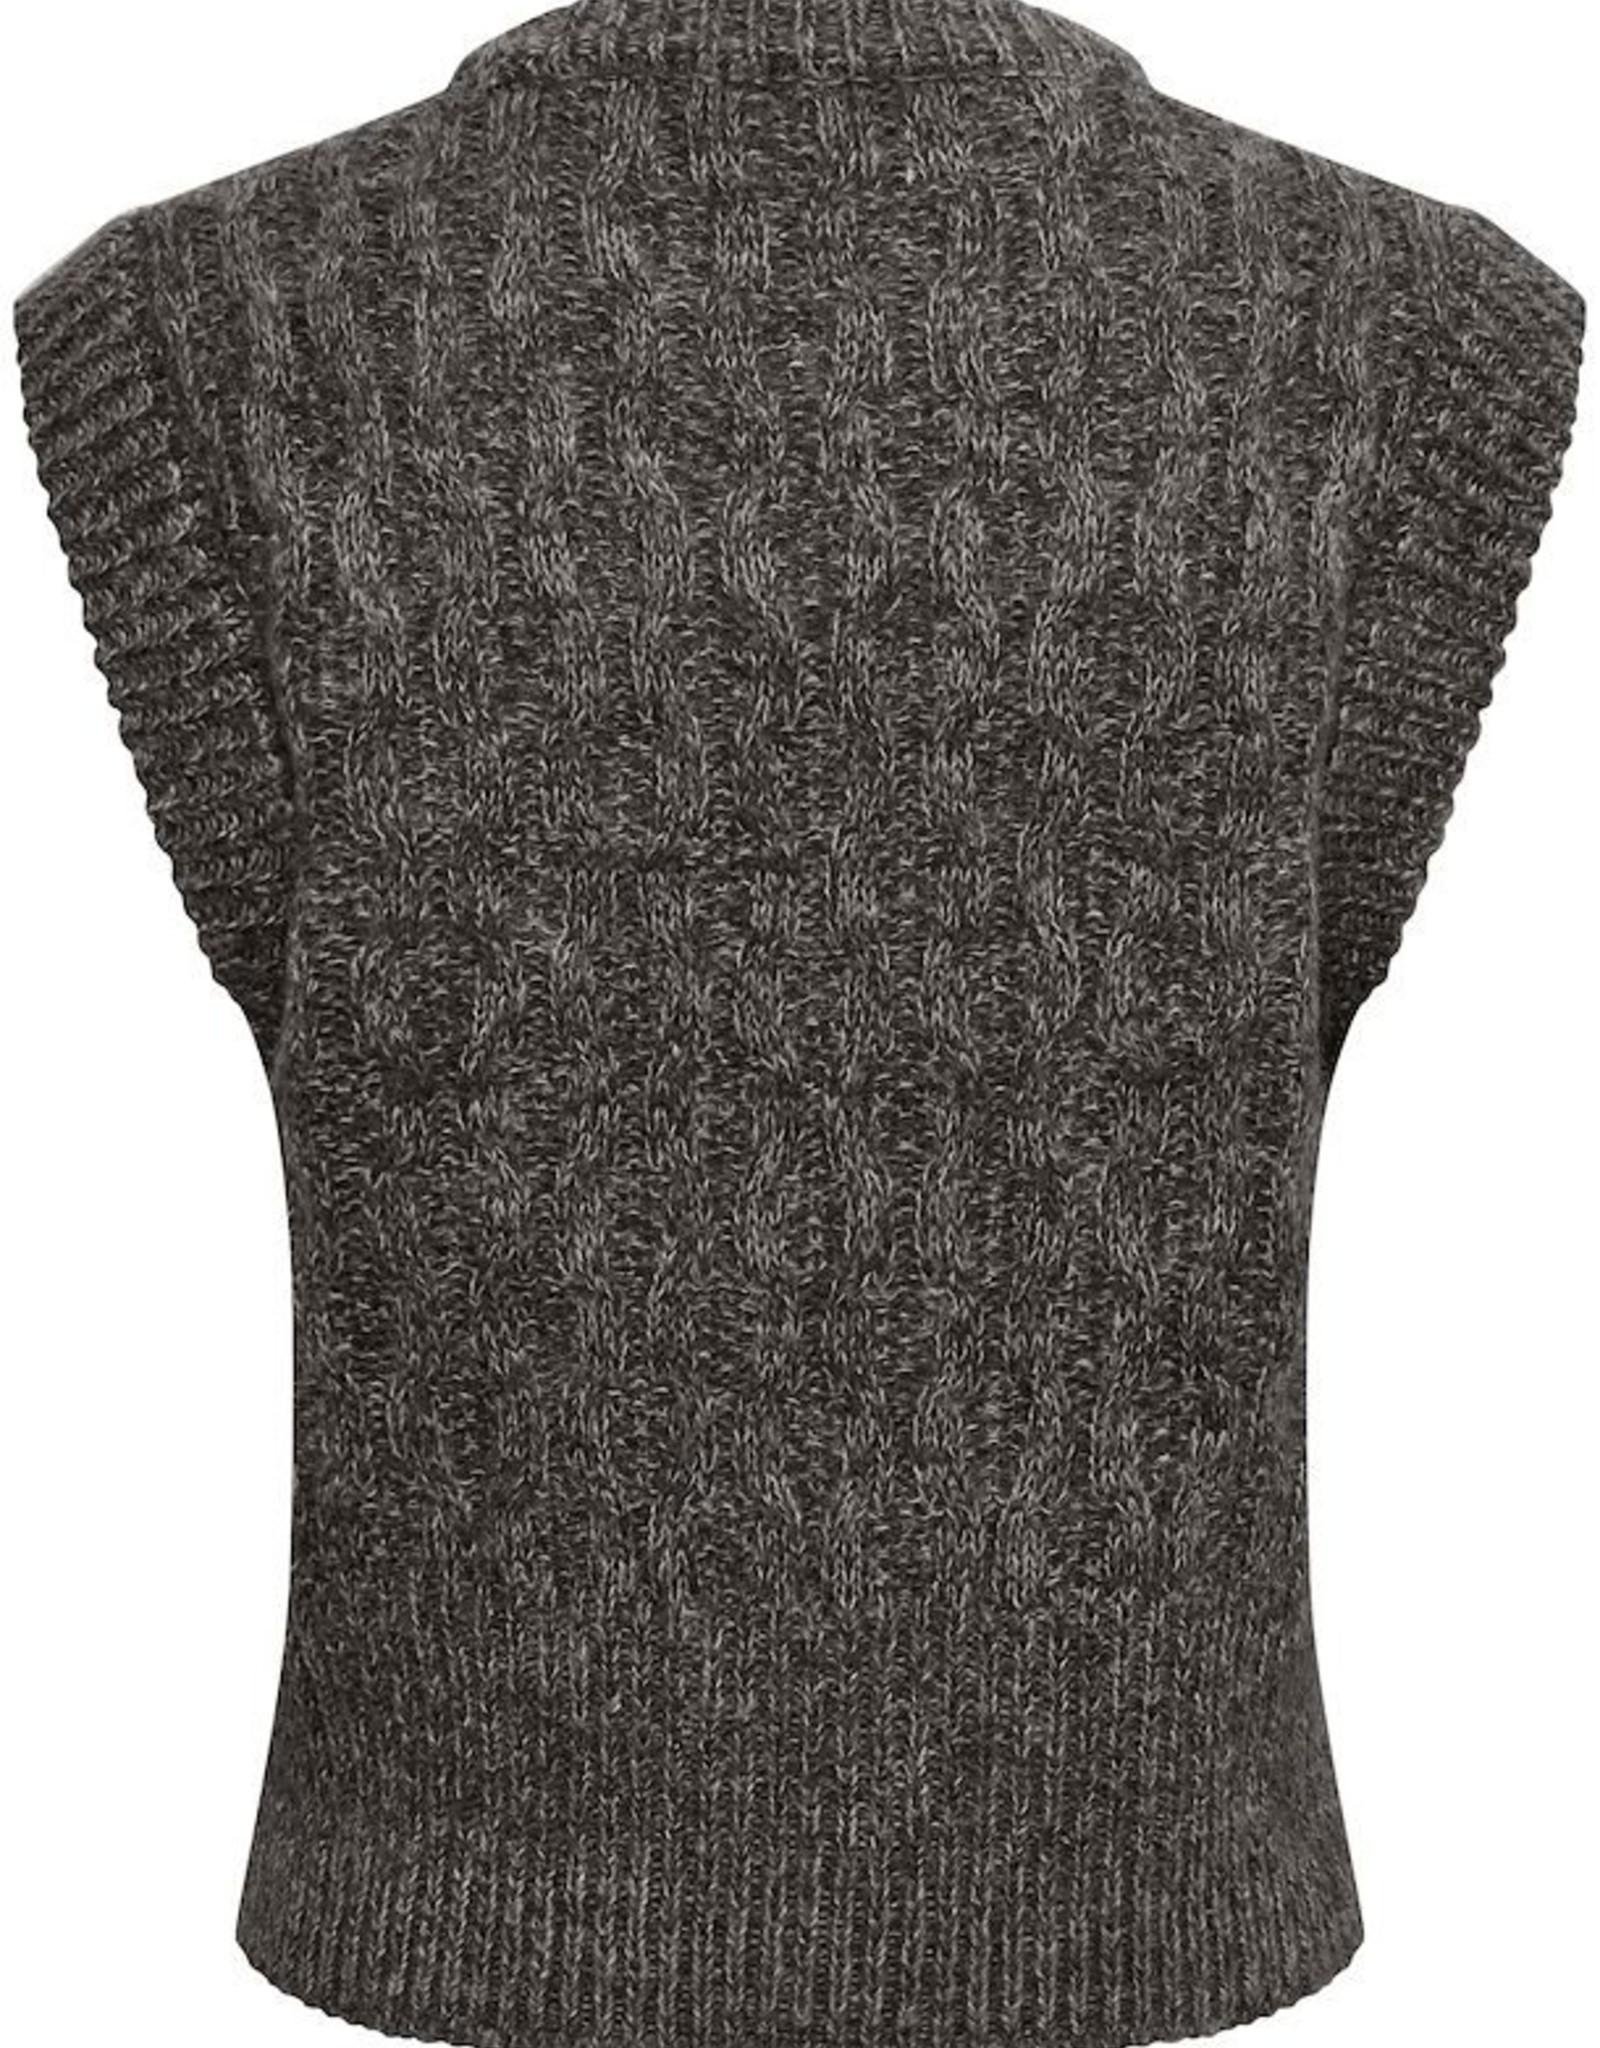 InWear Toana Vest Black